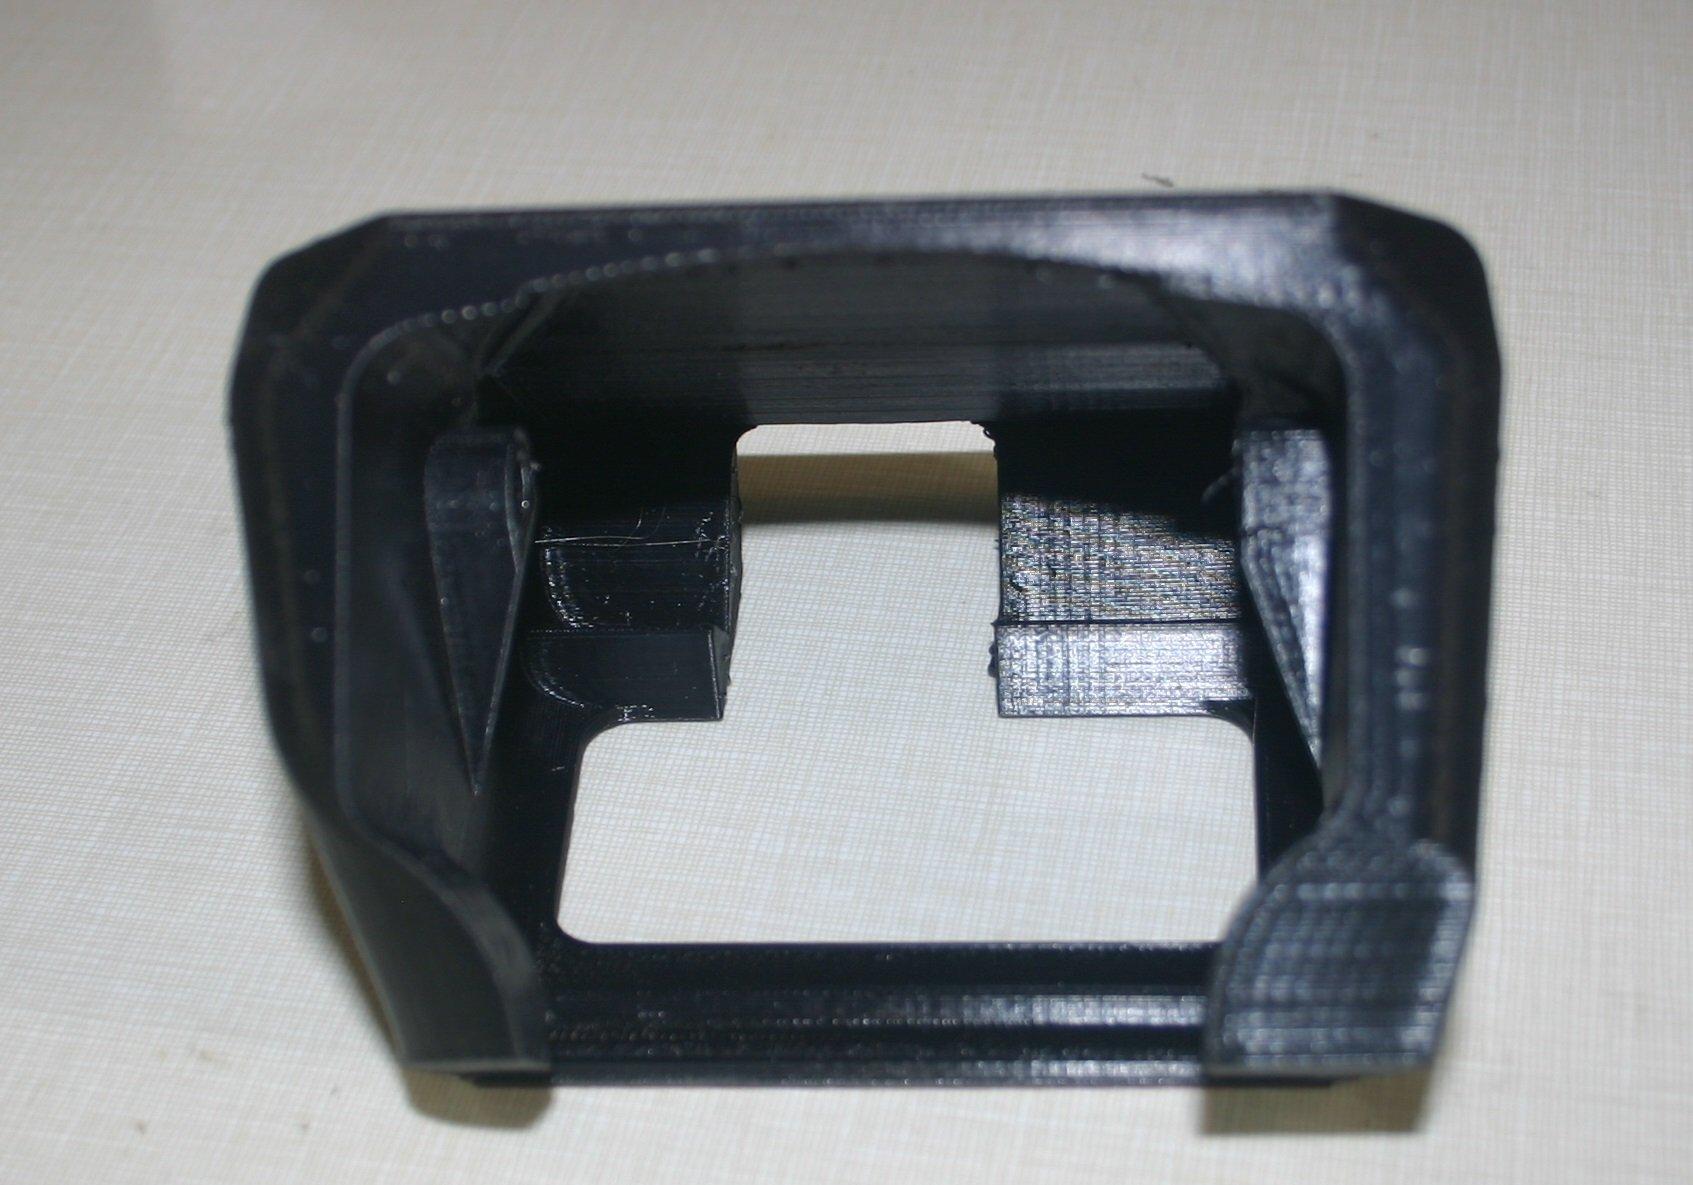 Dodge Durango Trailer Brake Controller Housing Classic City Plastics Wiring Image Of